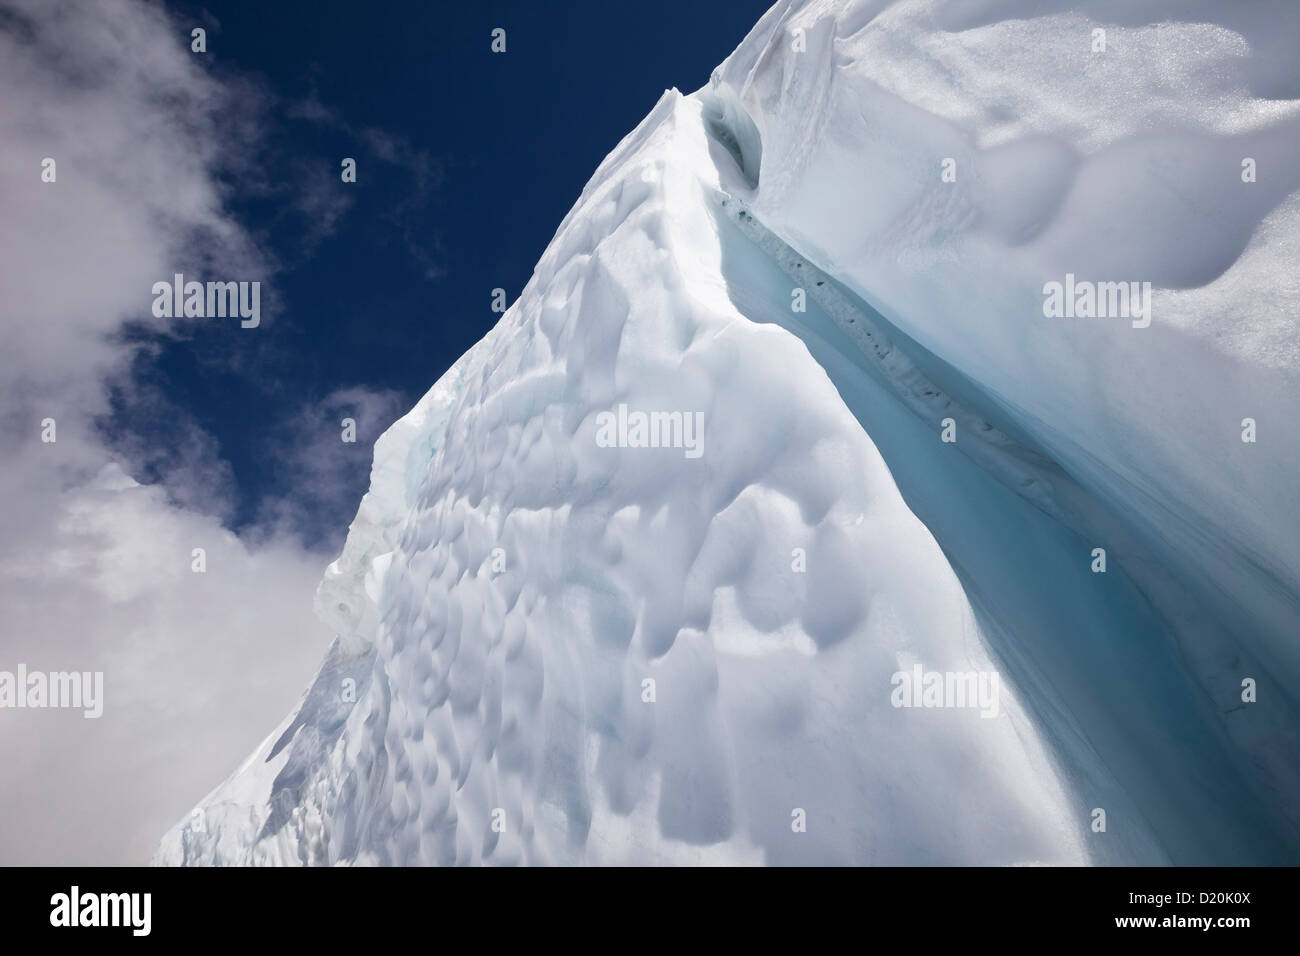 Klettersteig Chamonix : Eis riss am mont blanc du tacul chamonix frankreich